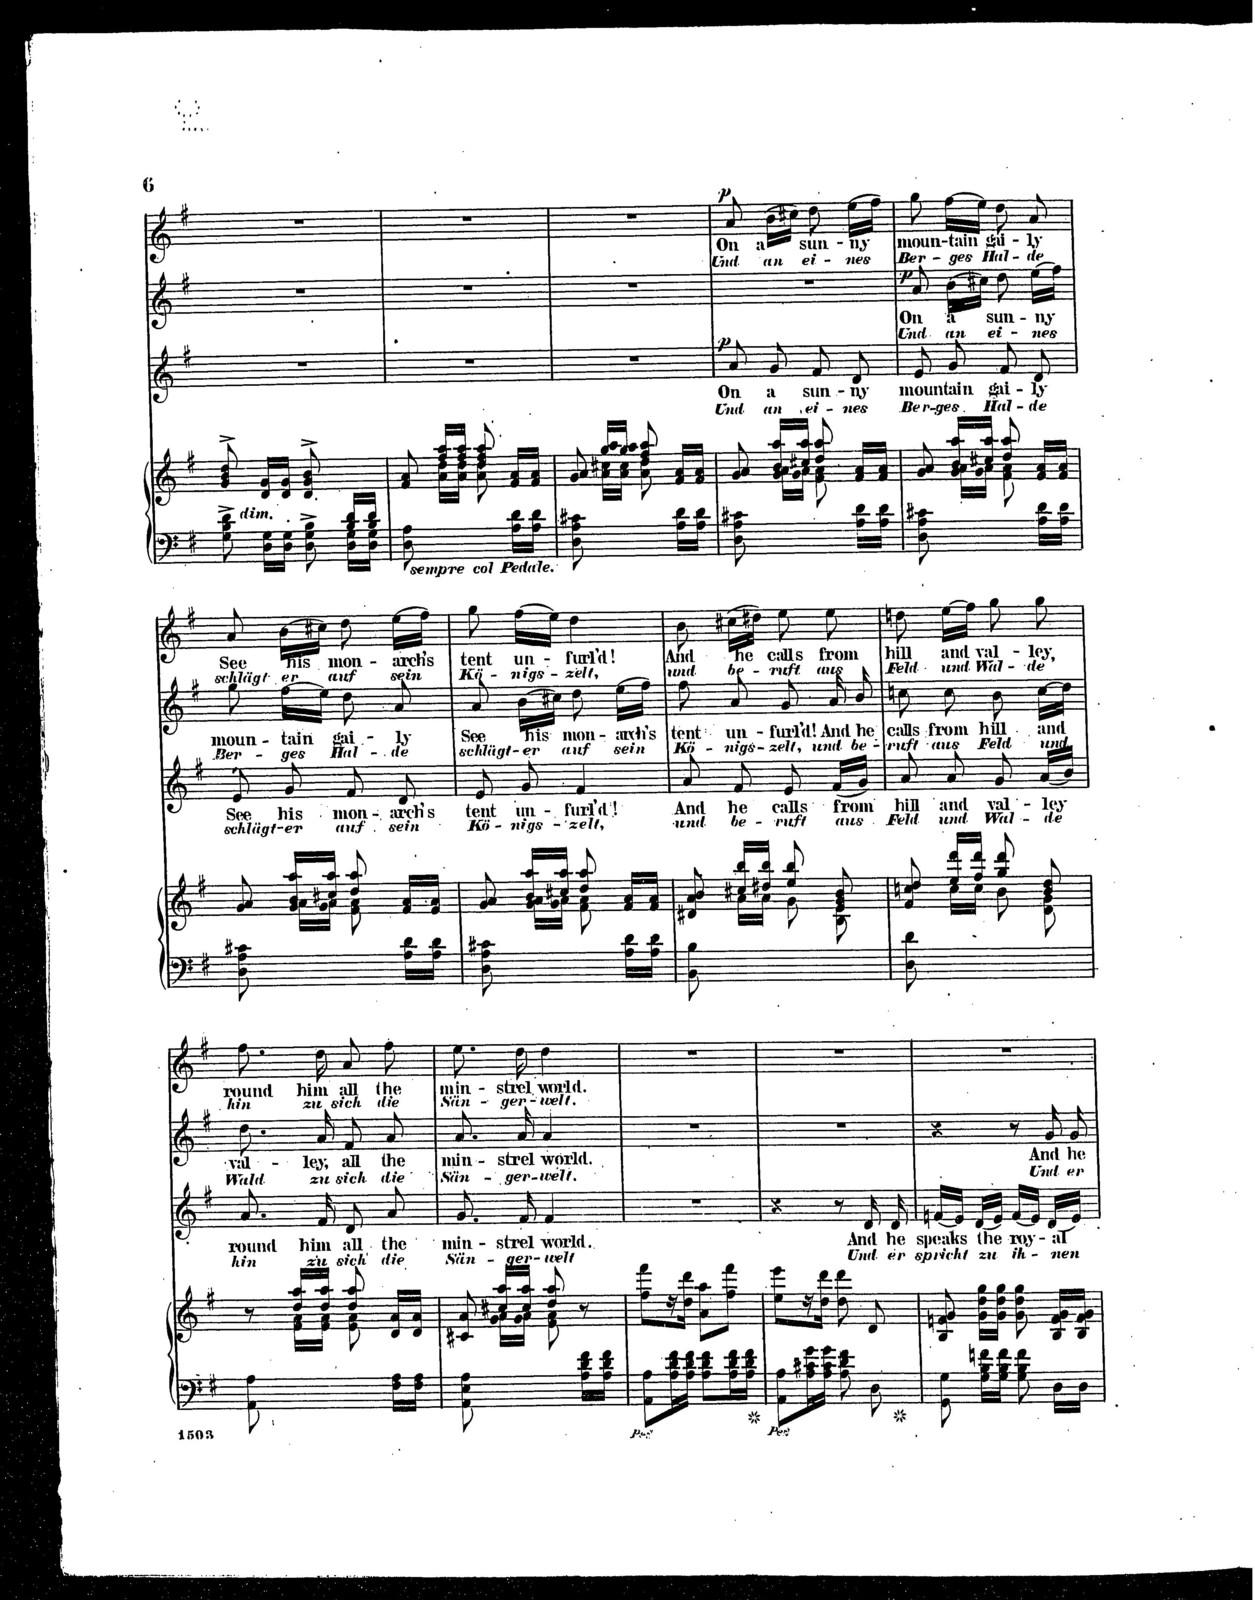 May bells - Maienglc̲klein